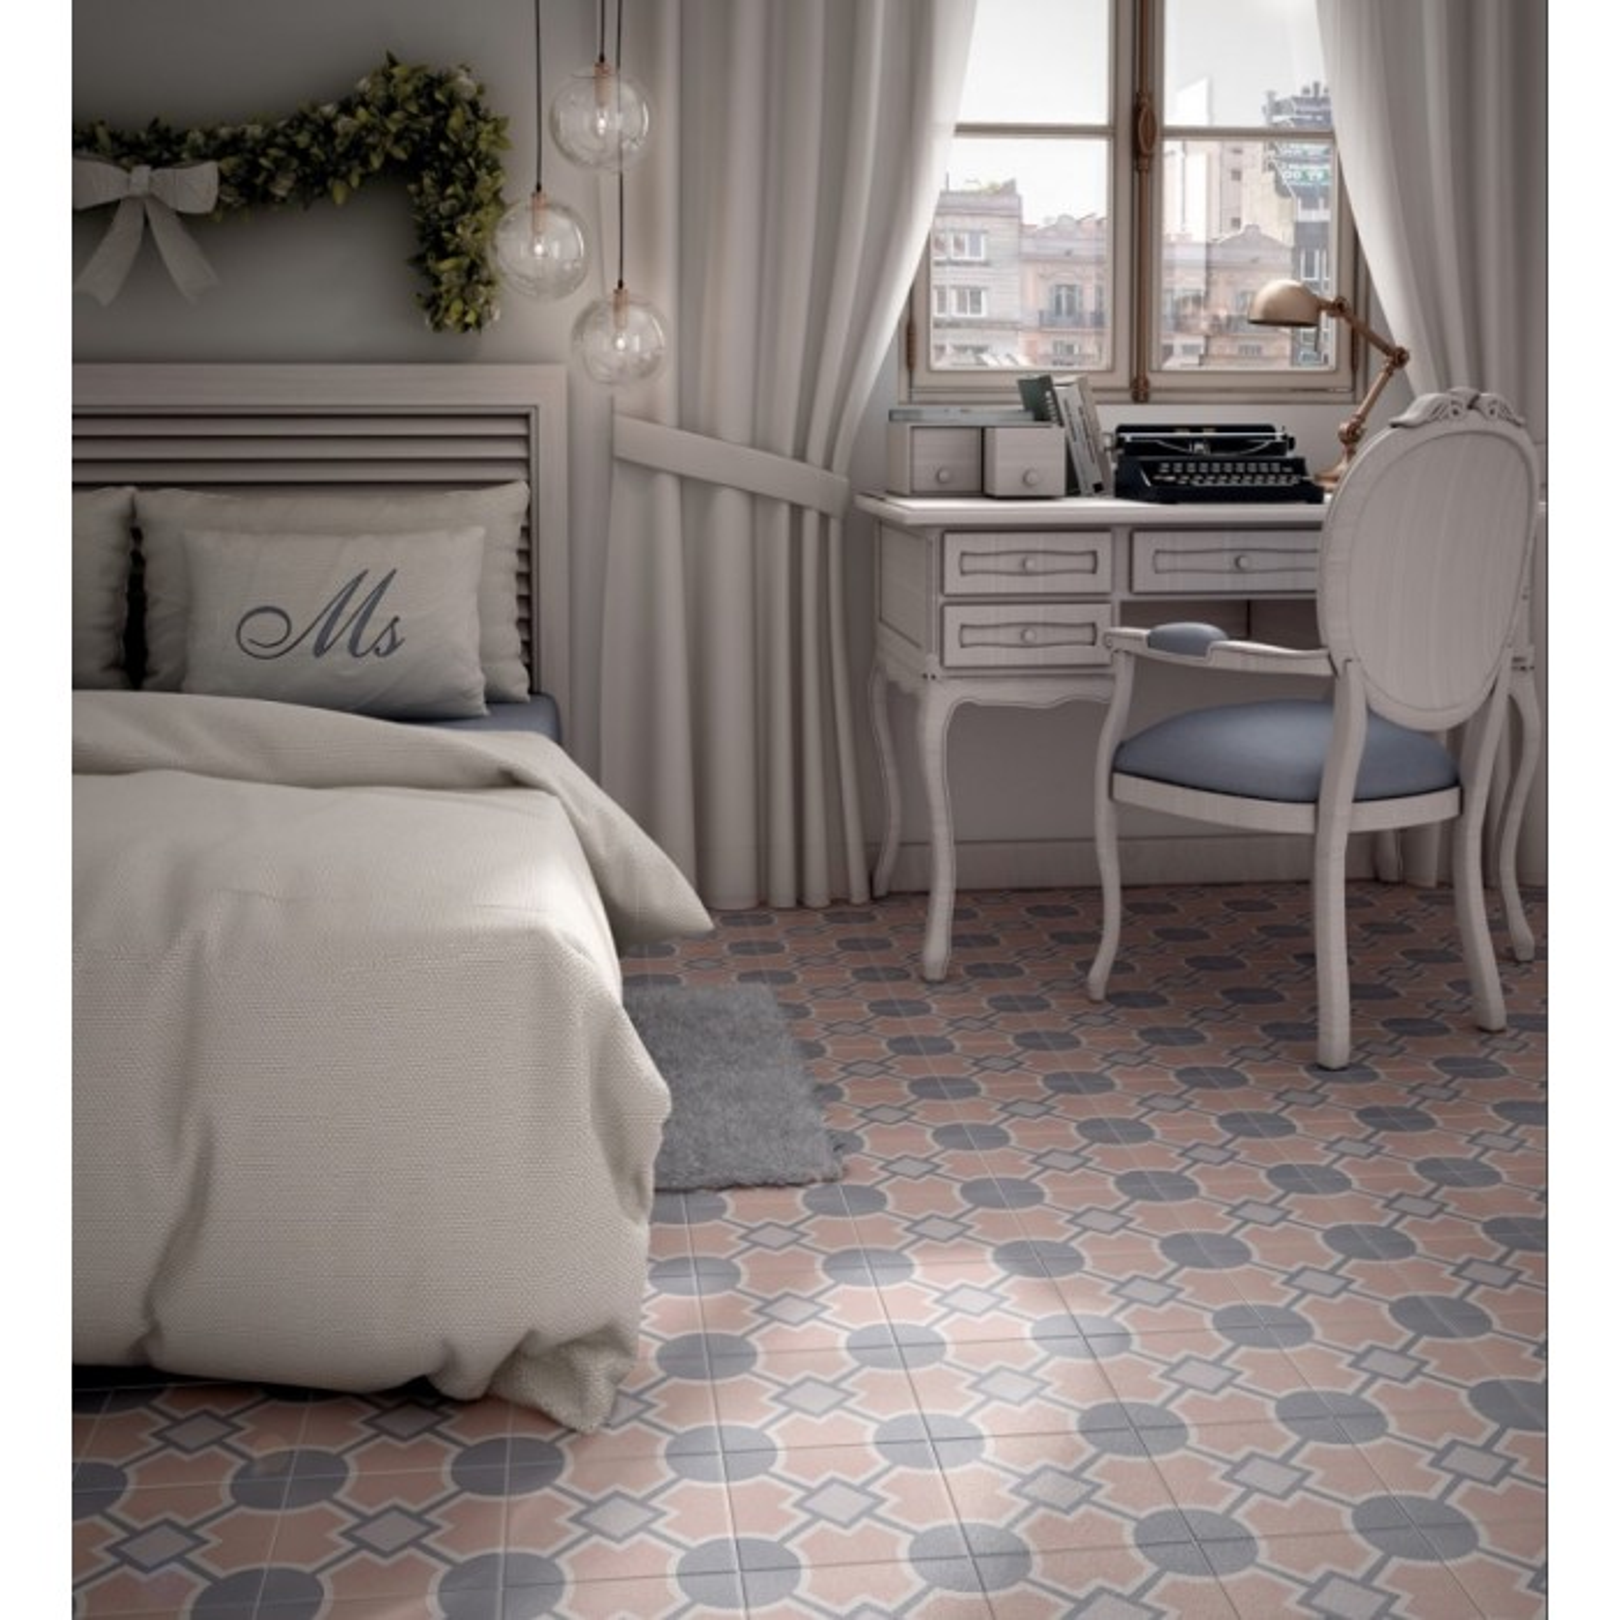 carrelage gr s c rame effet carreau ciment caprice deco pastel solstice casalux home design. Black Bedroom Furniture Sets. Home Design Ideas